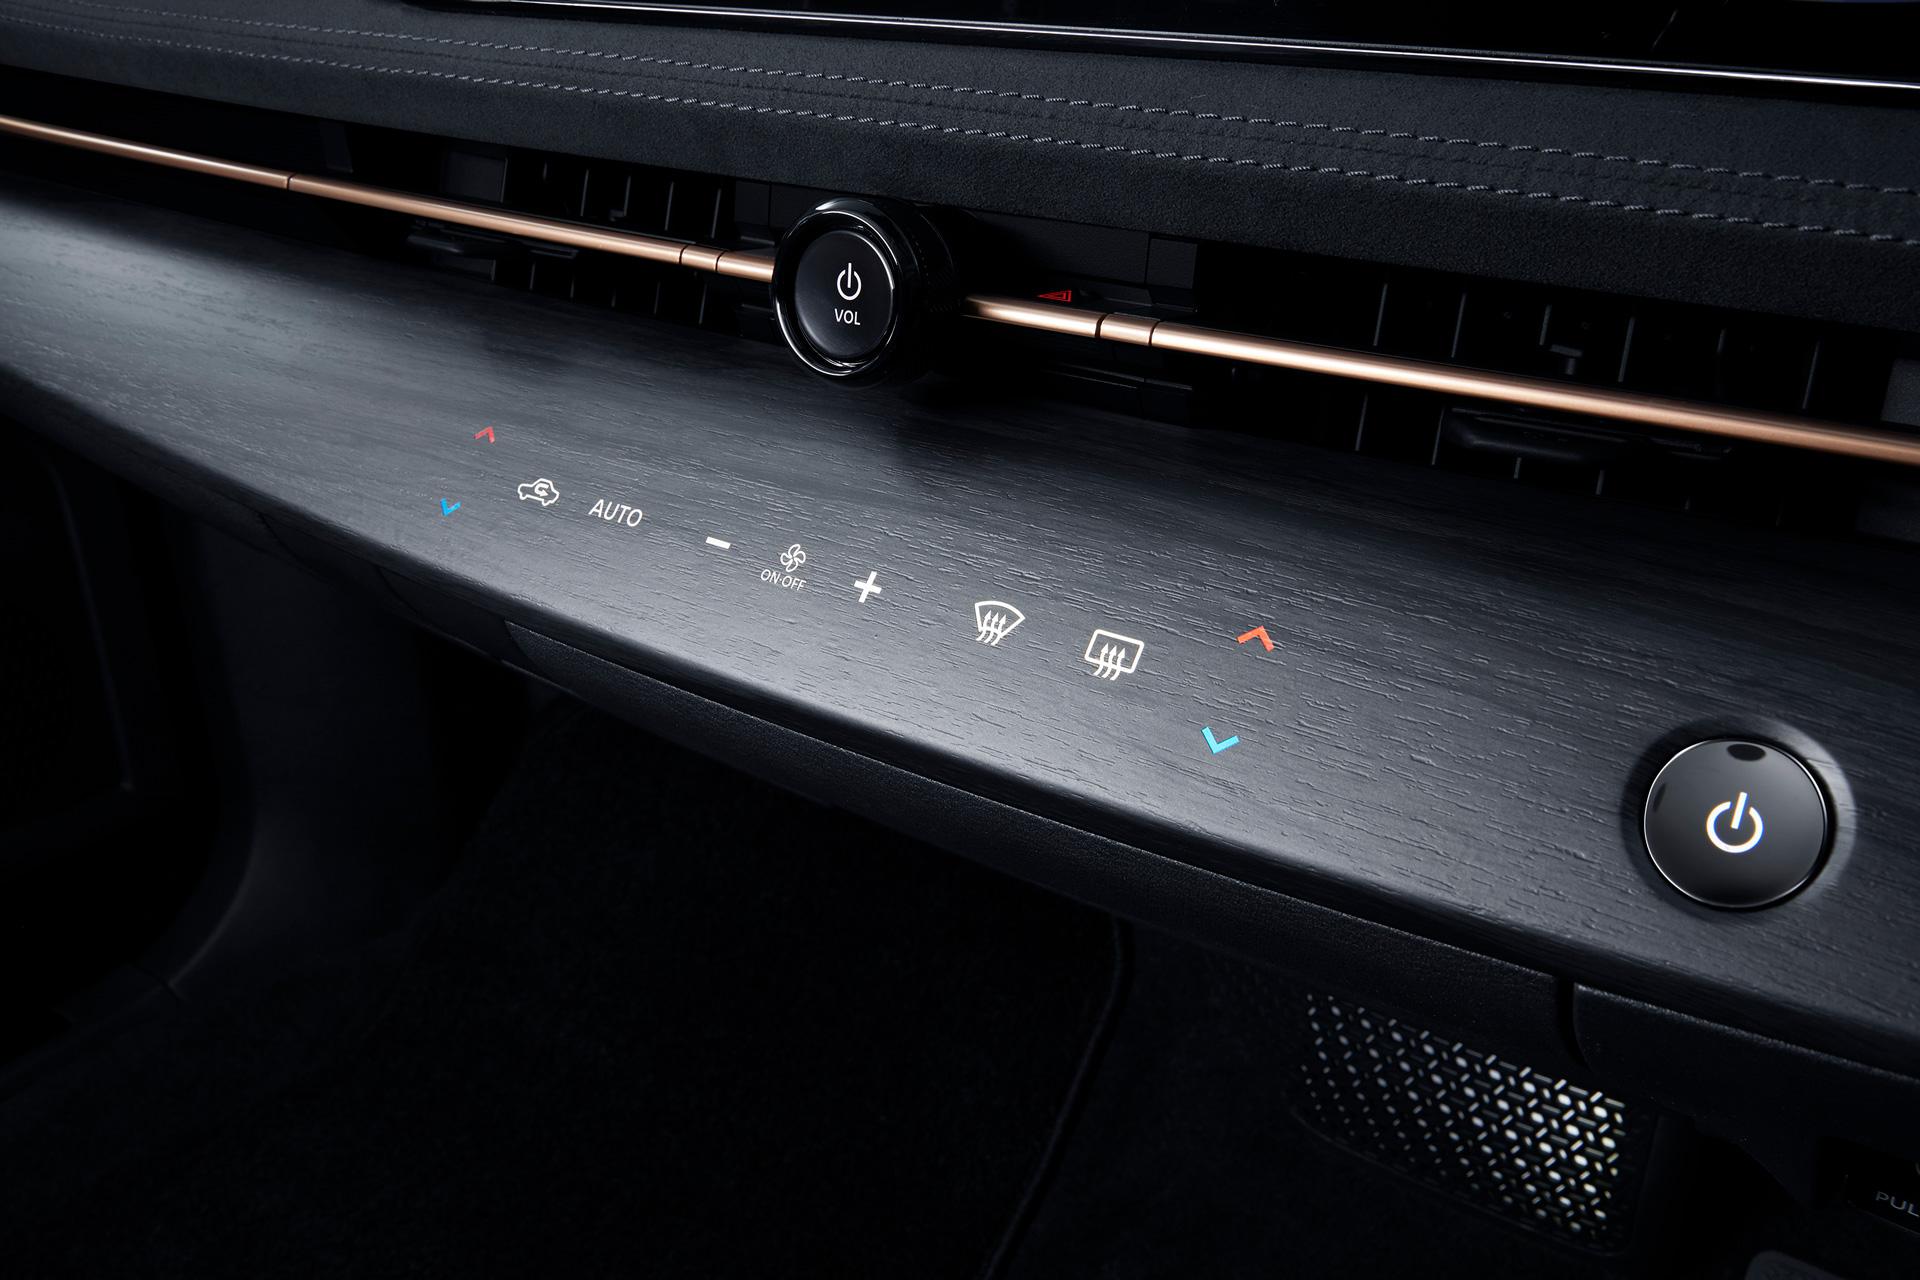 Nissan ARIYA interiør instrumentpanel tændt